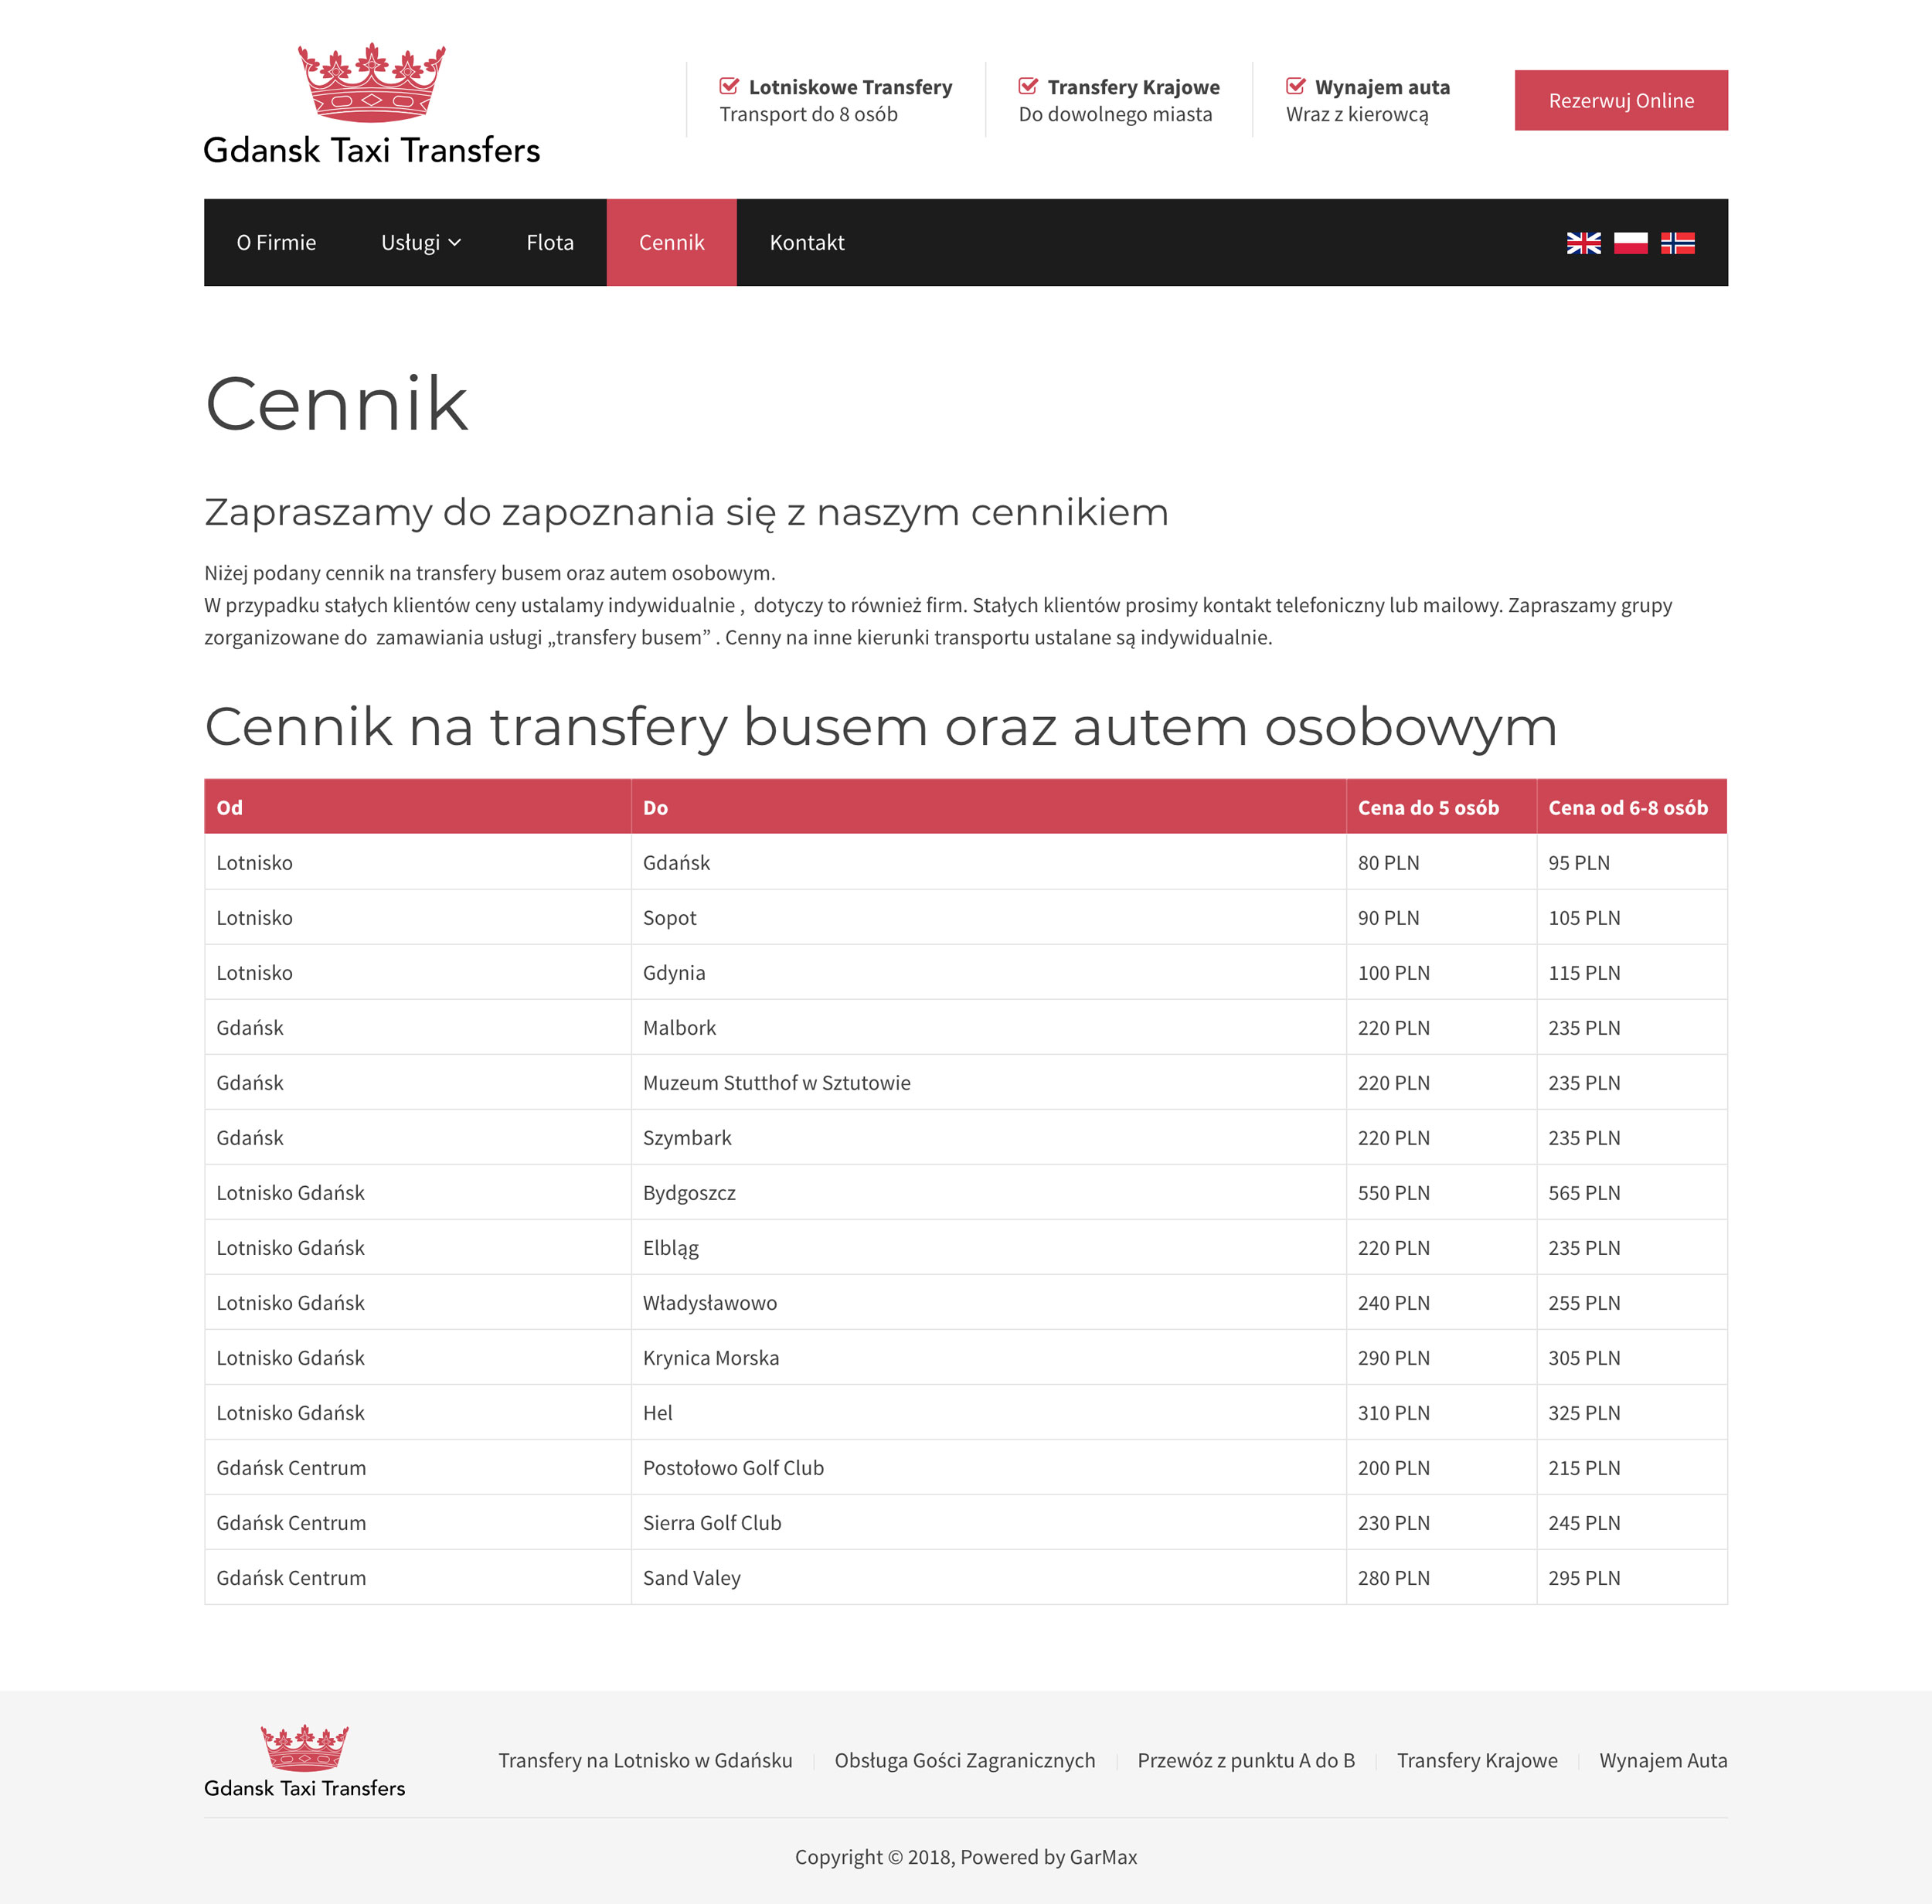 Gdańsk Taxi Transfers - Cennik